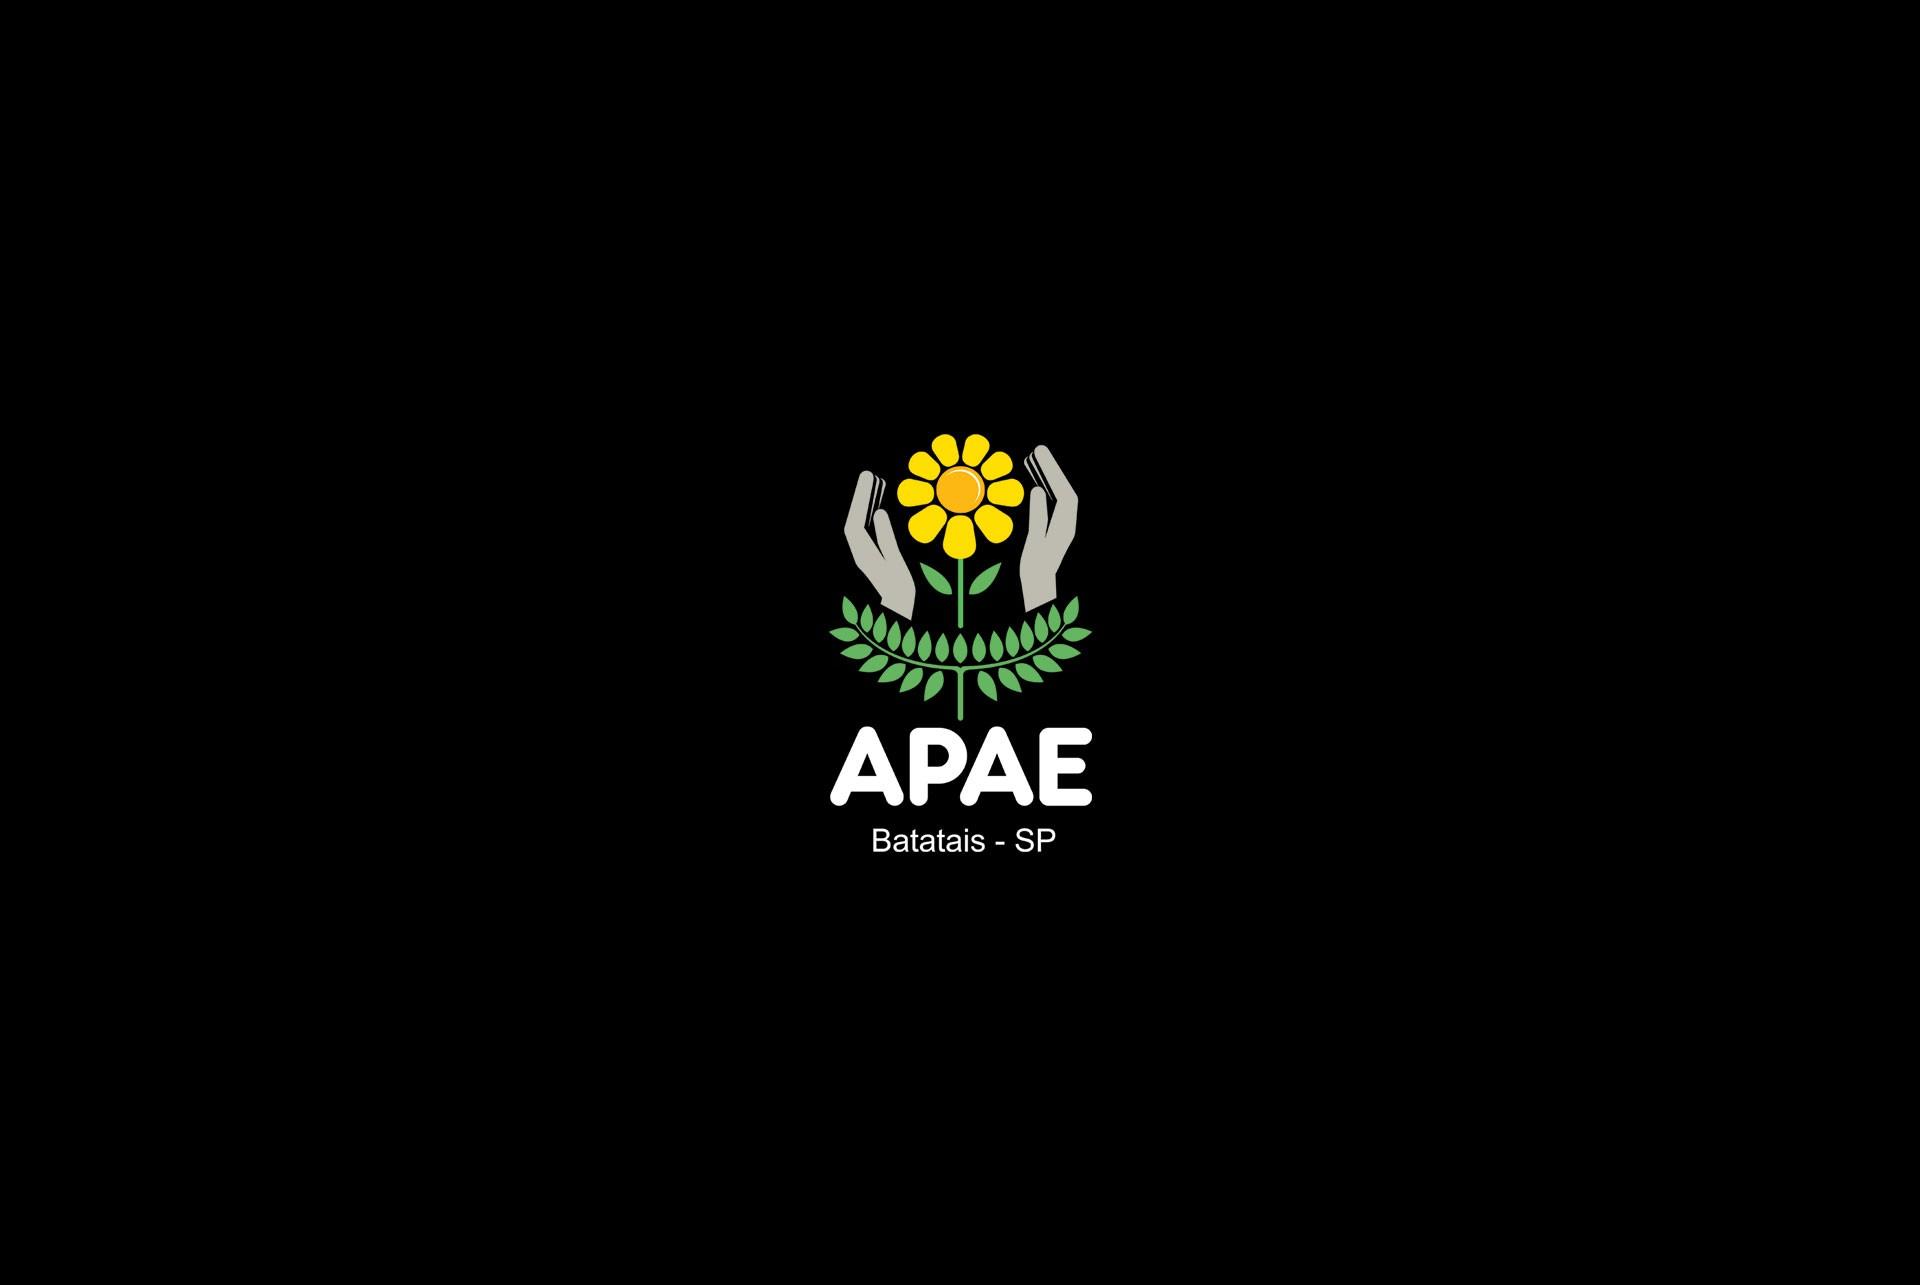 APAE Batatais